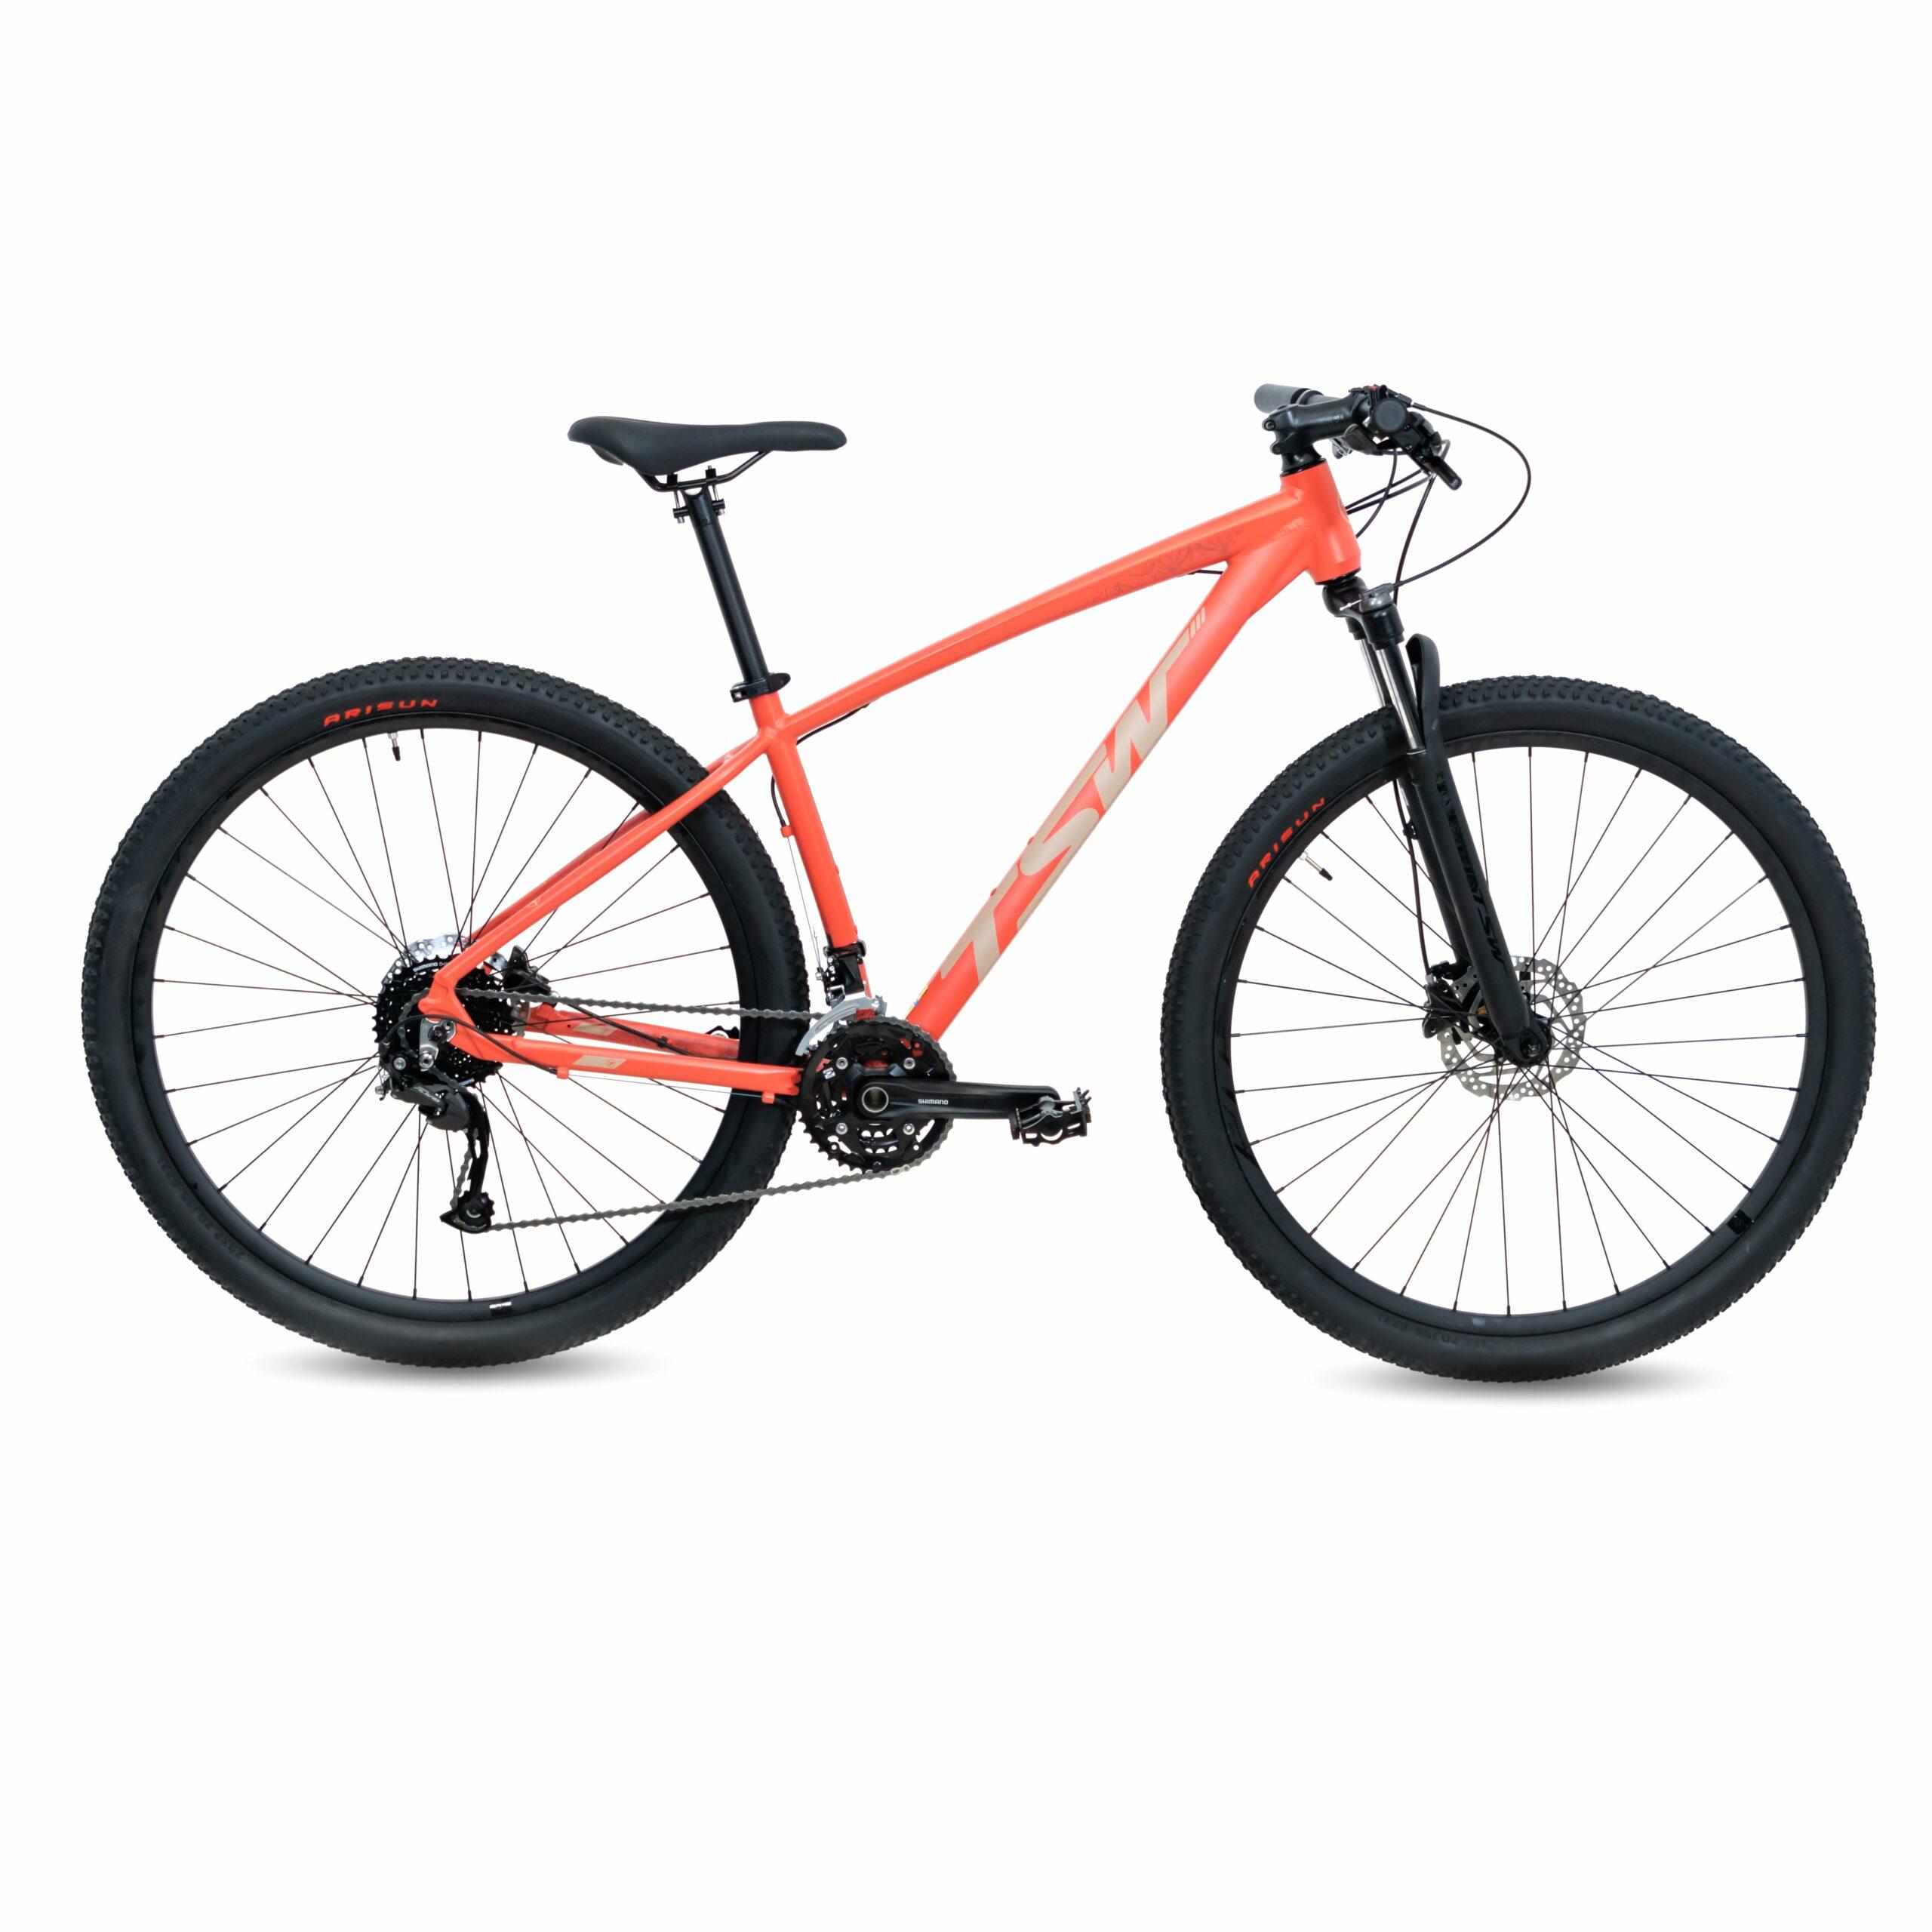 Bicicleta TSW Hunch Plus | 2021/2022 4